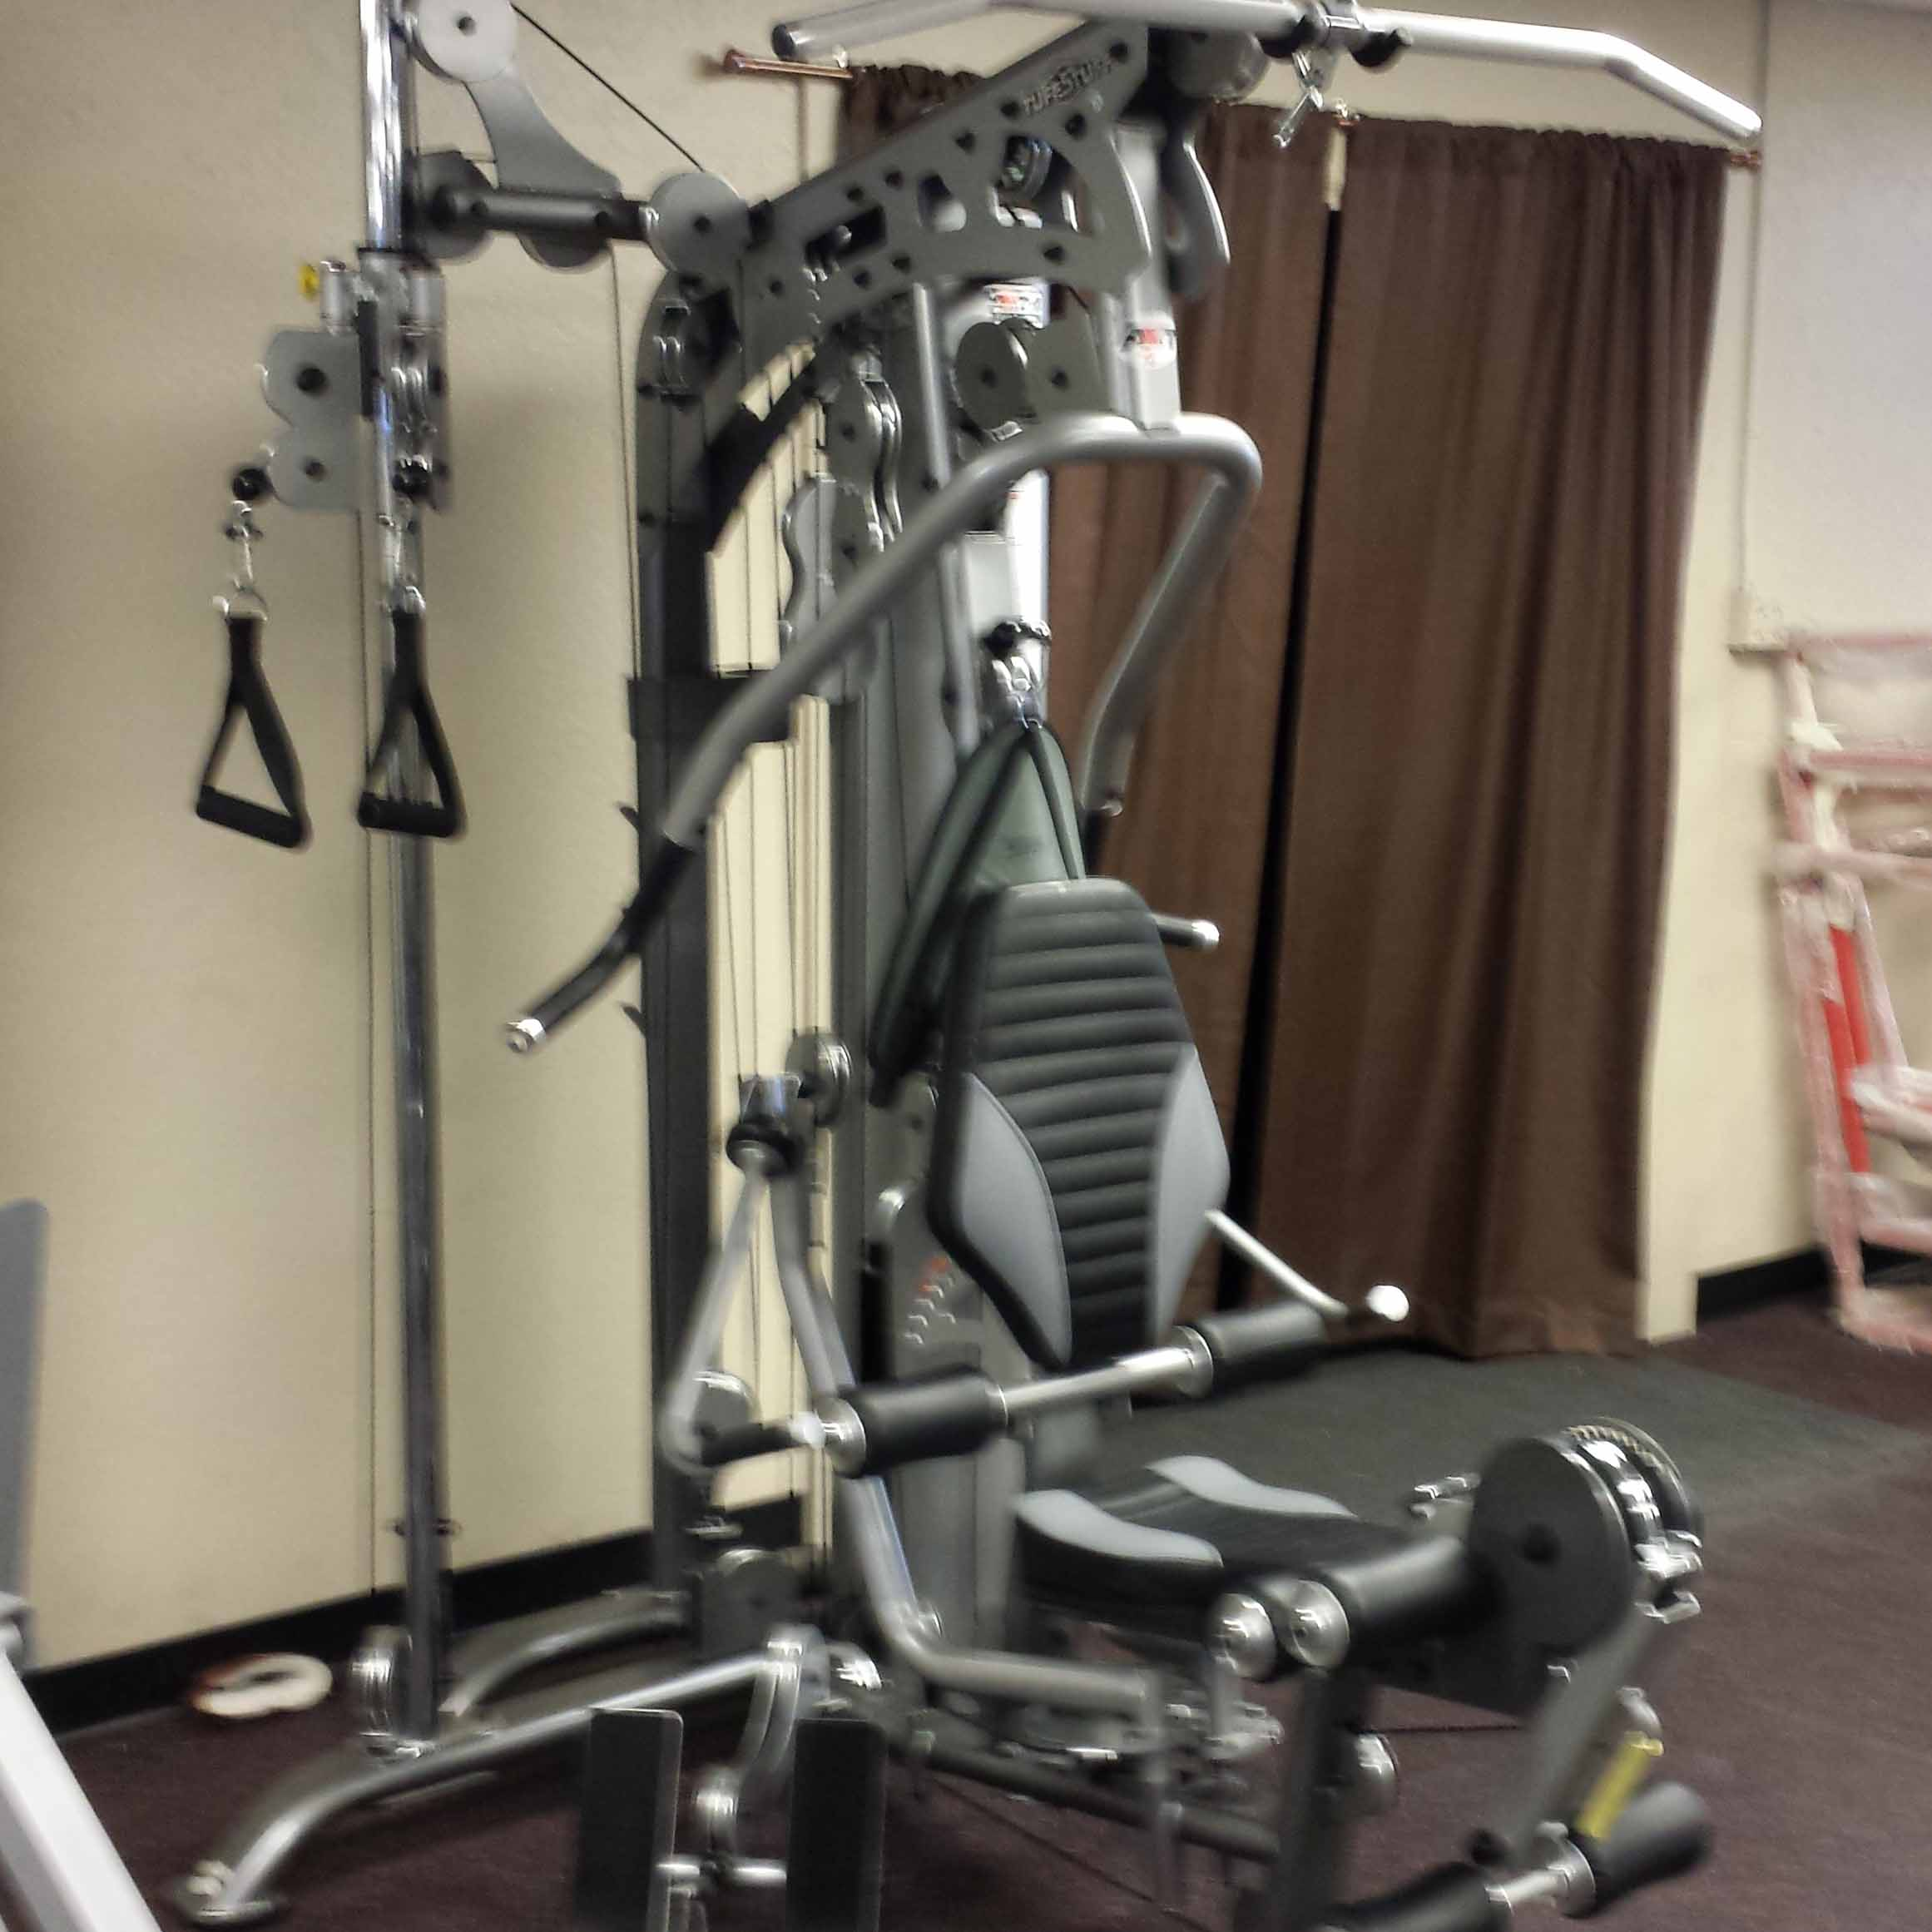 Proform xp exercise bike reviews, home elliptical consumer ...